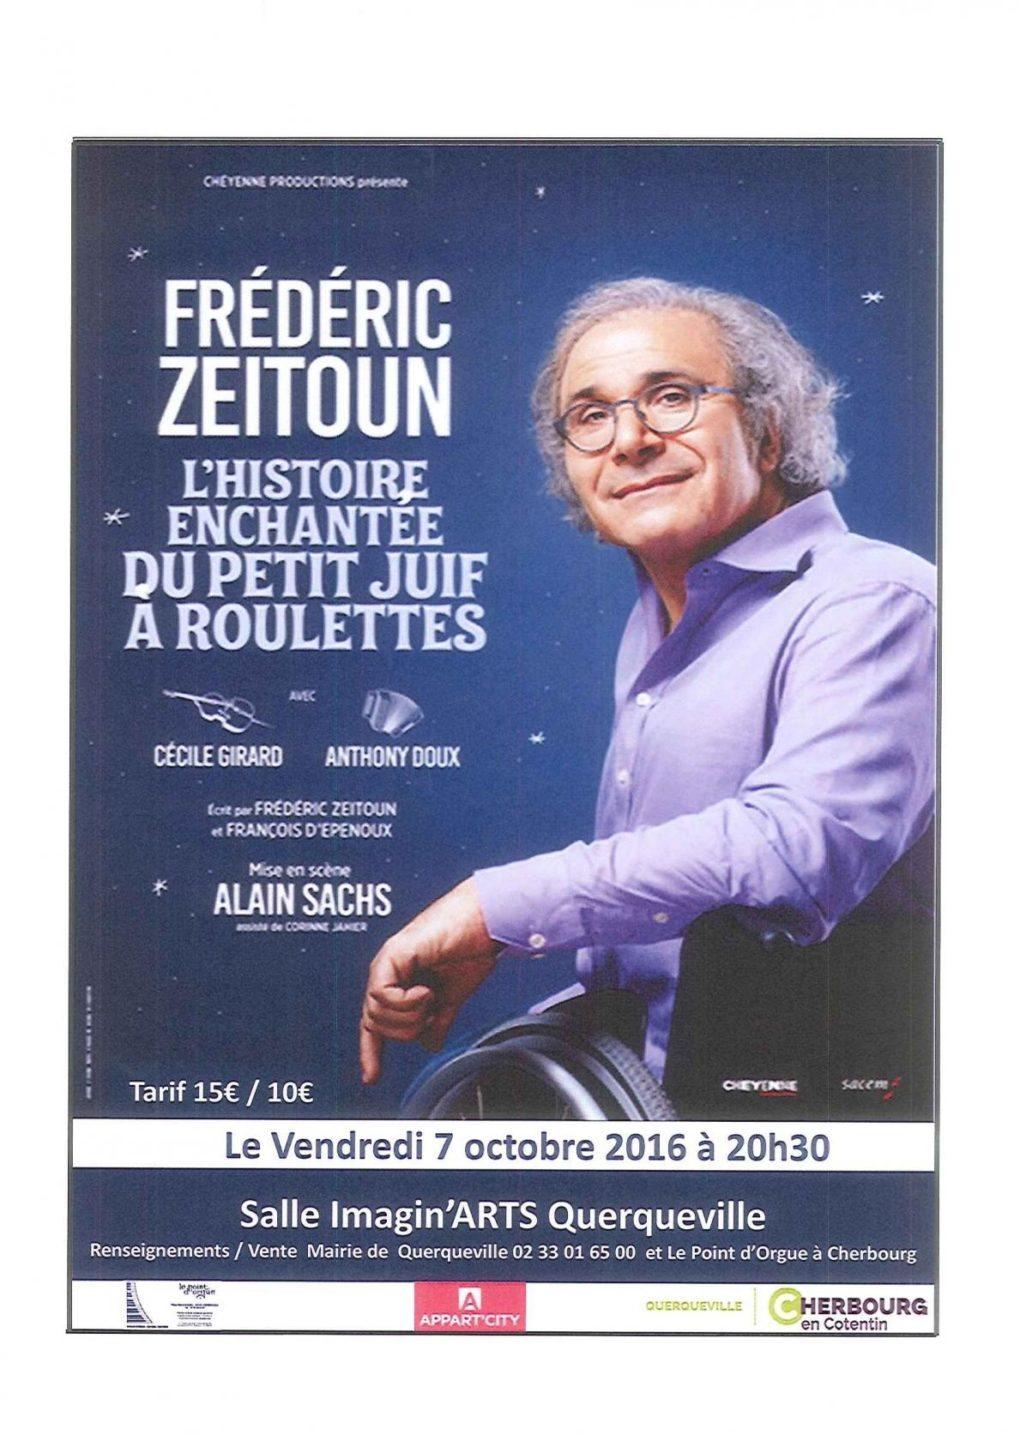 Frédéric Zeitoun Cherbourg-en-Cotentin